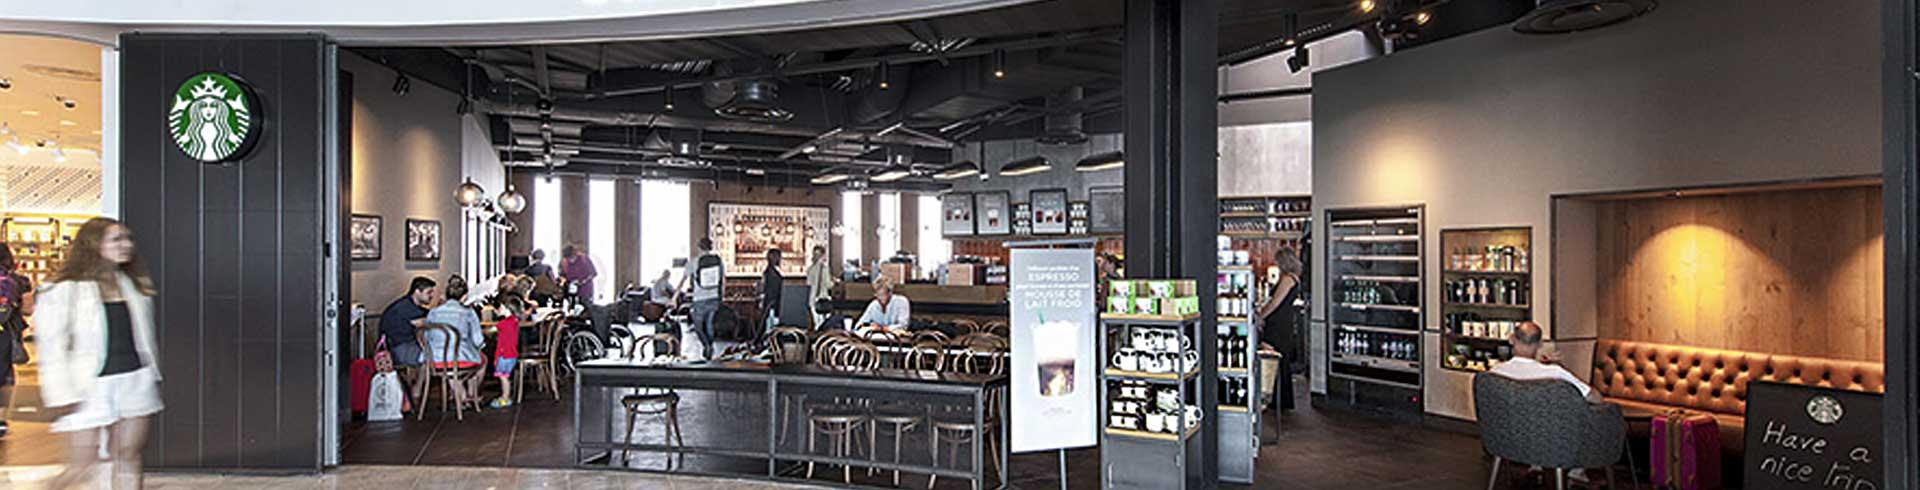 Starbucks Meeting Room